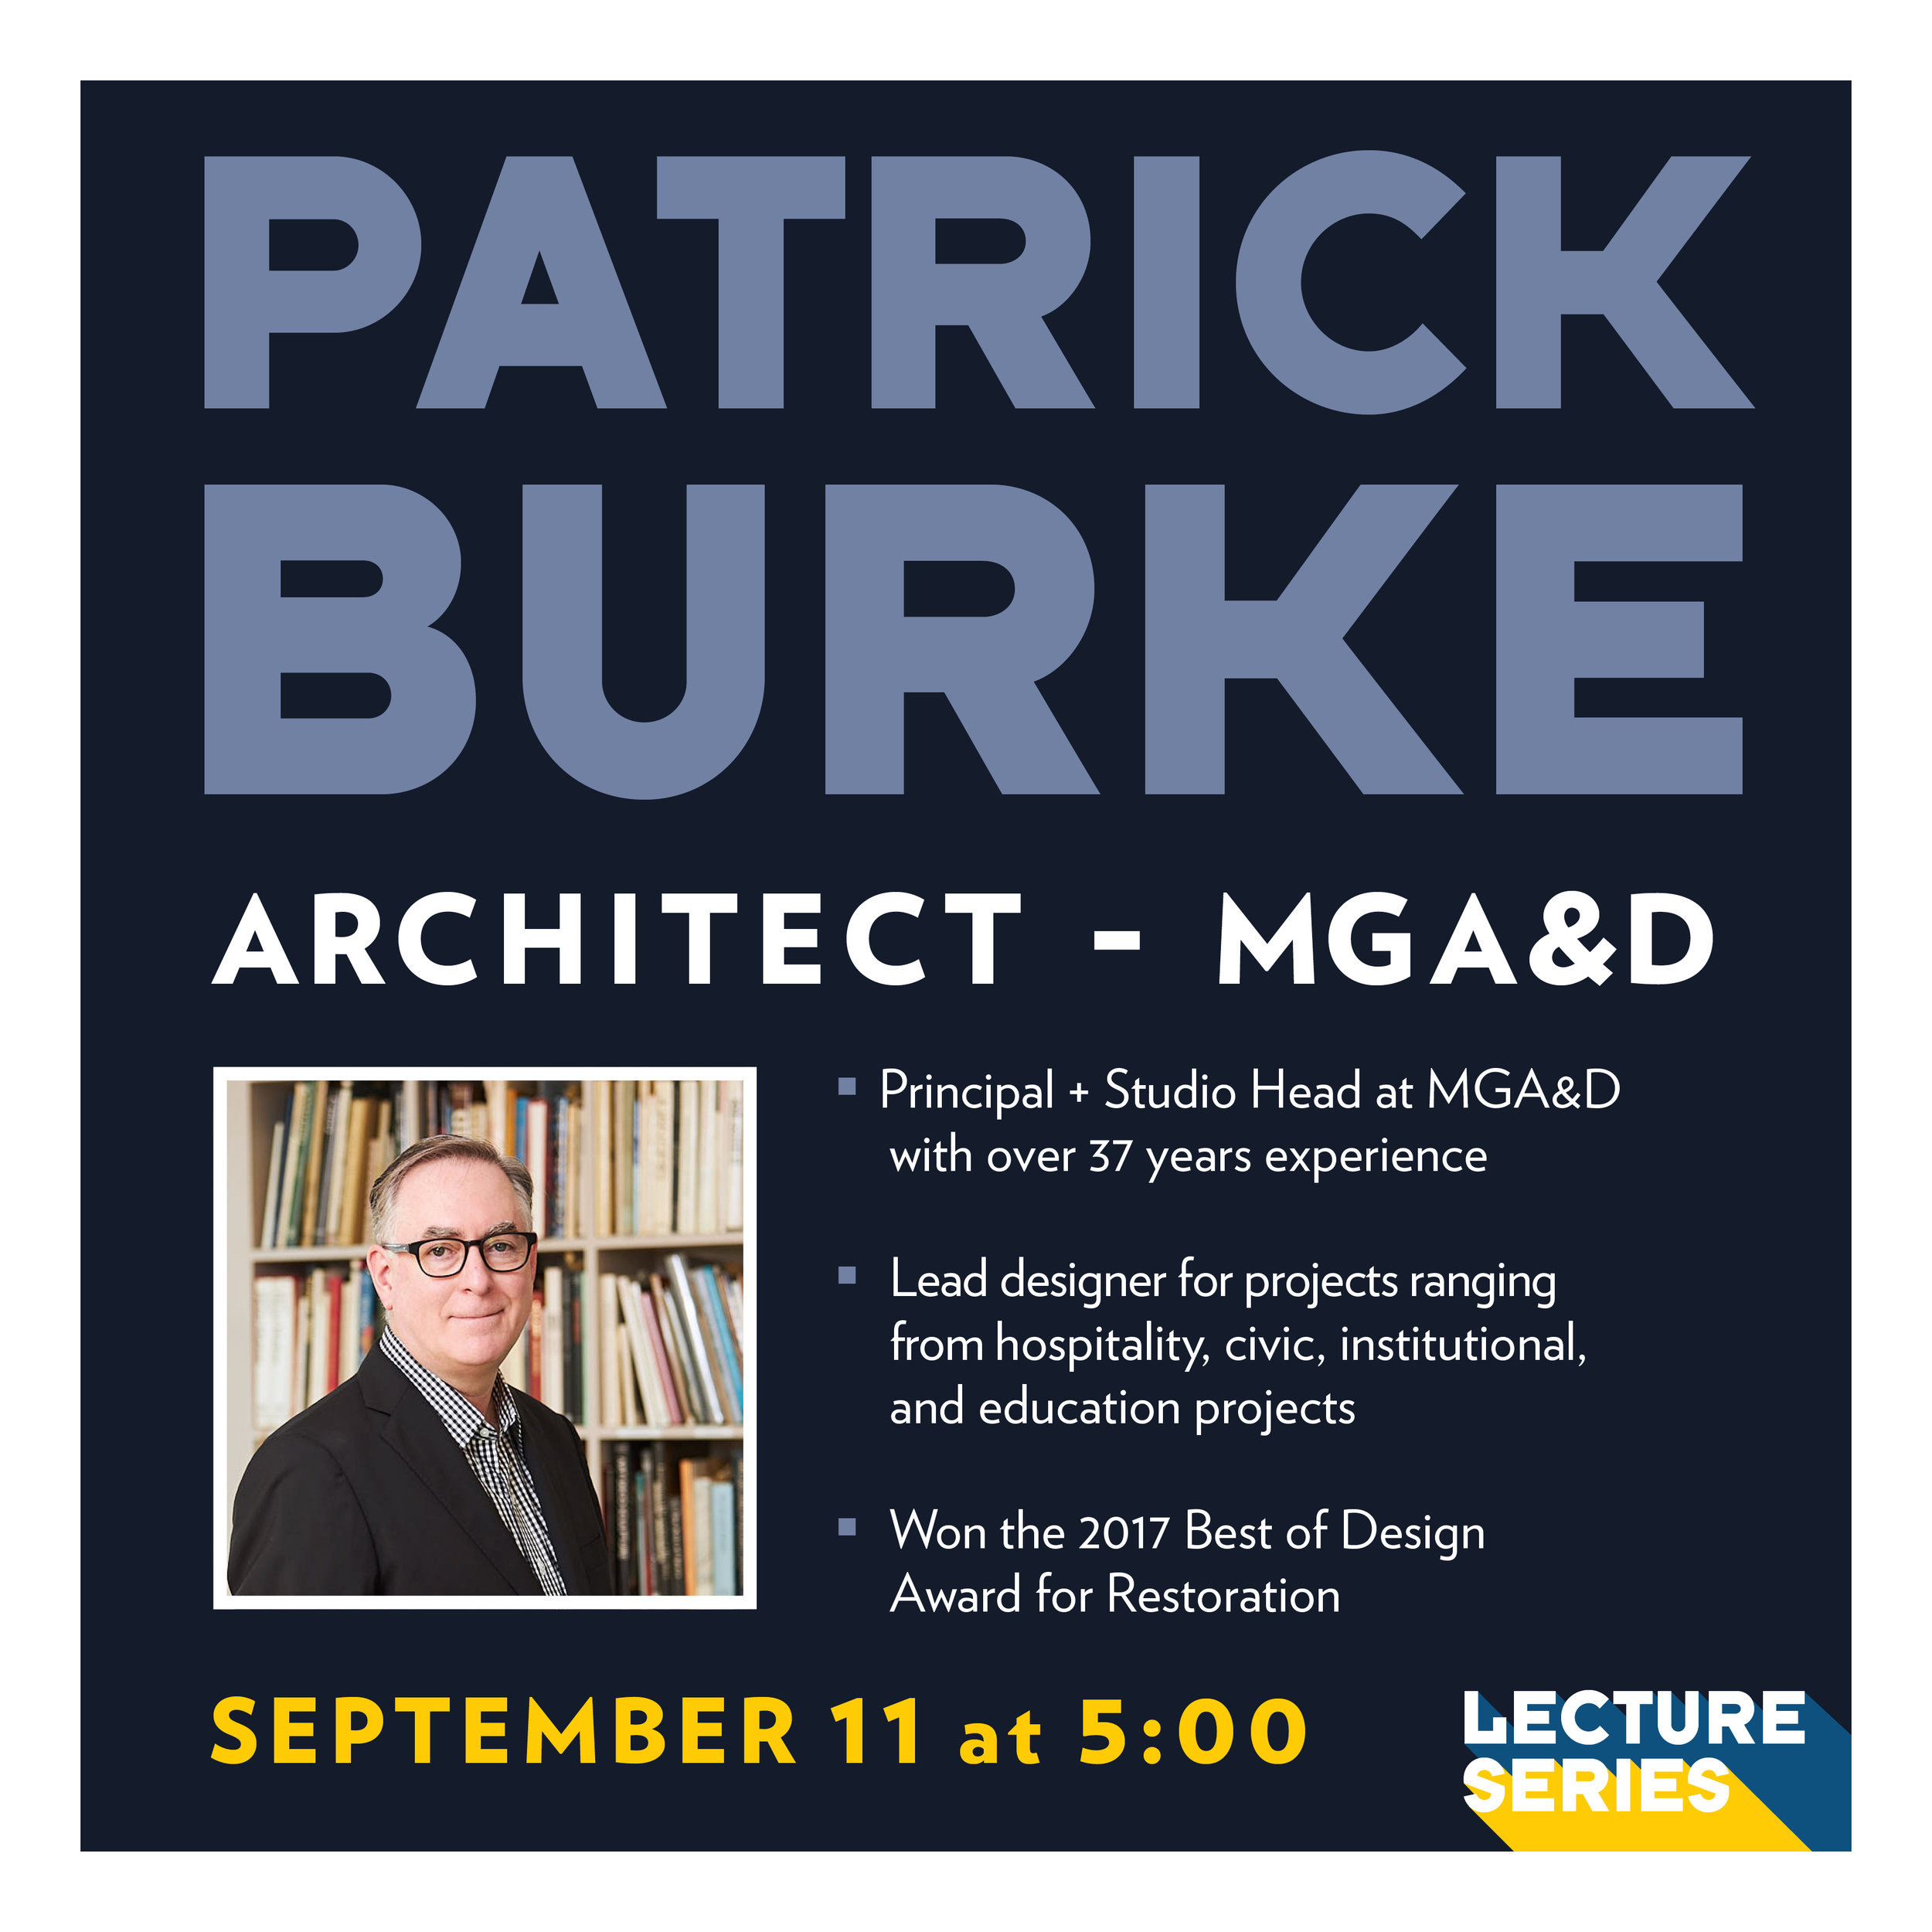 MGC_LectureSeries_PatrickBurke.jpg